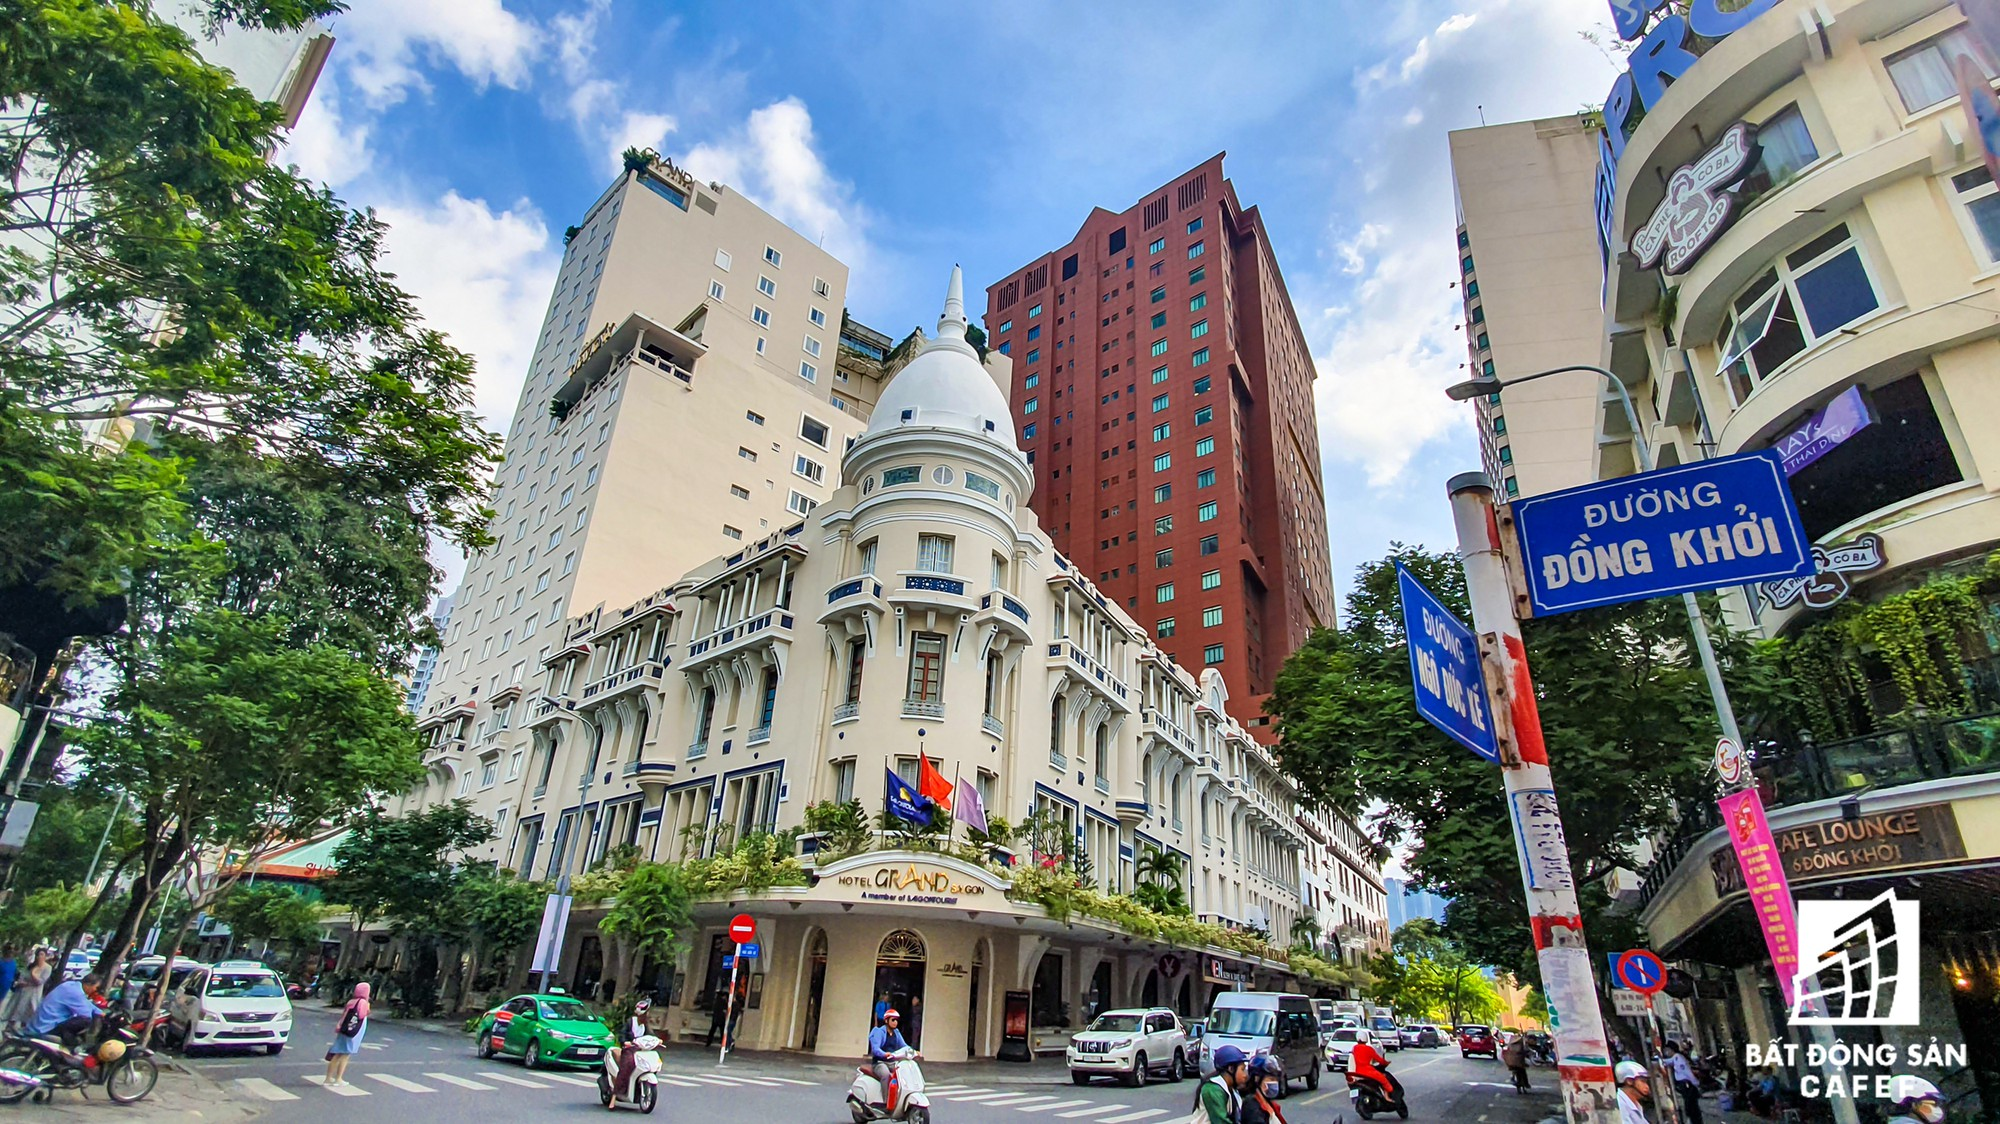 Se promener à la rue Dong Khoi